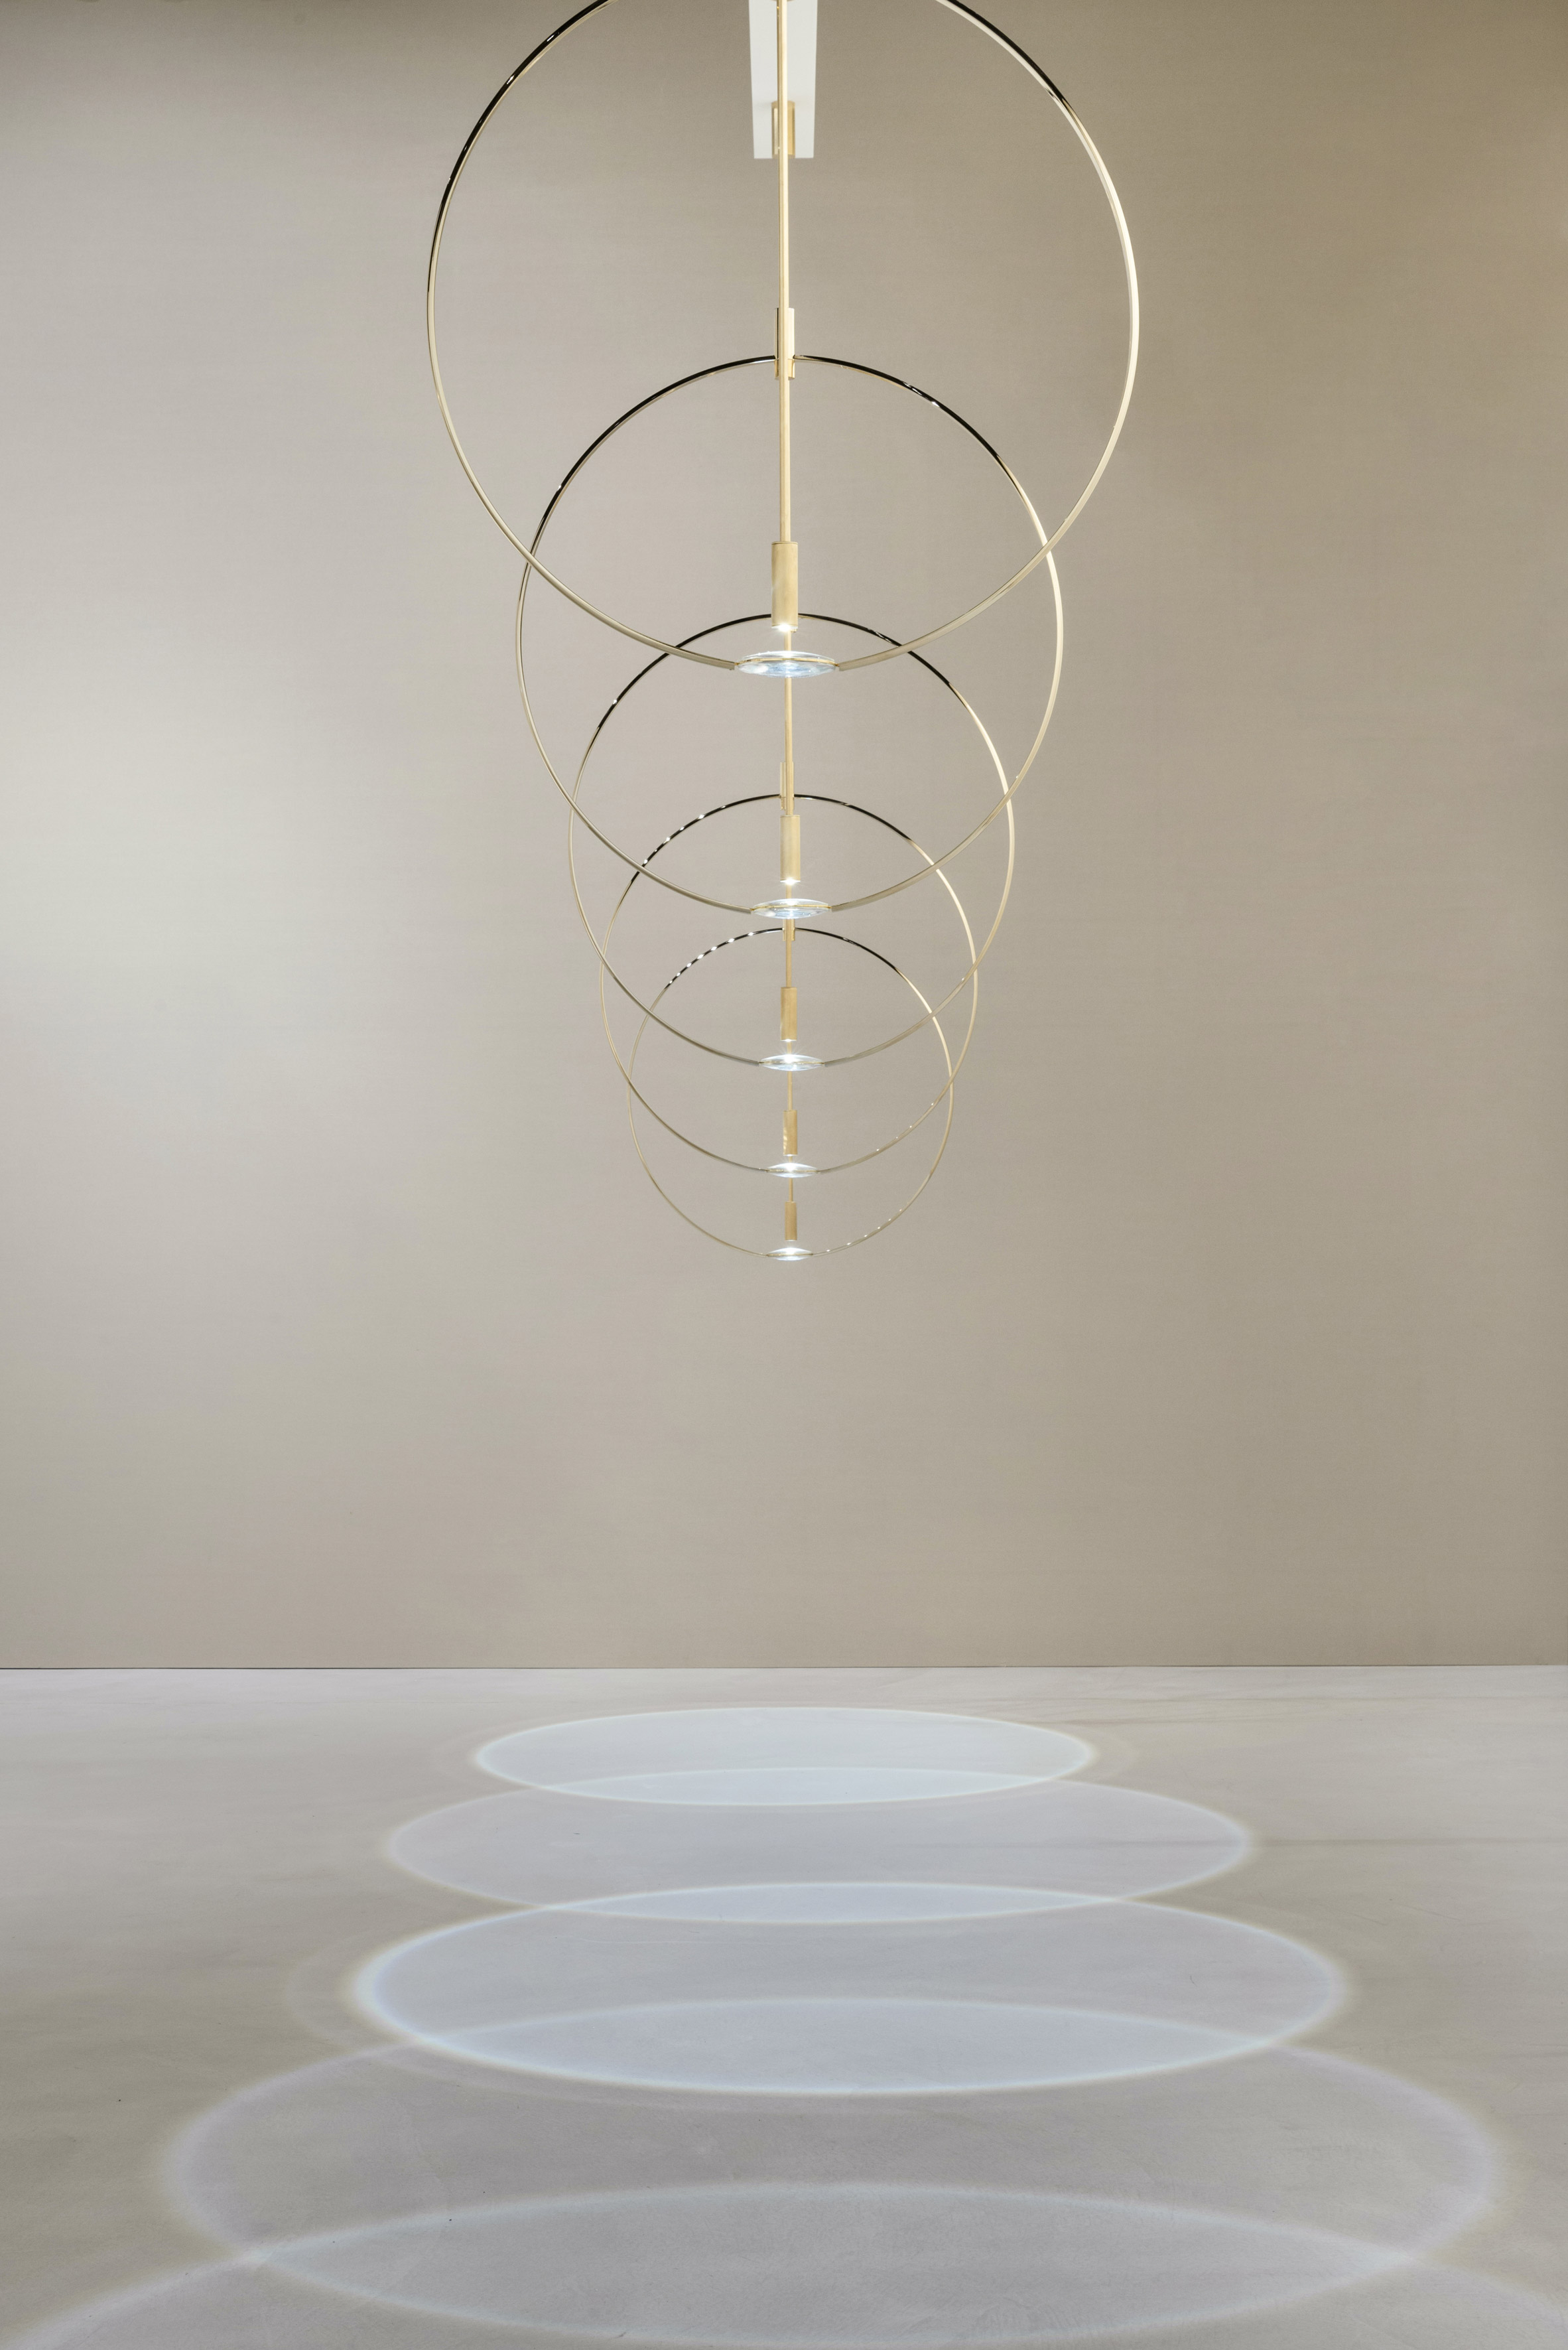 Formafantasma presents lighting designs that exploit geometry, colour and shadow